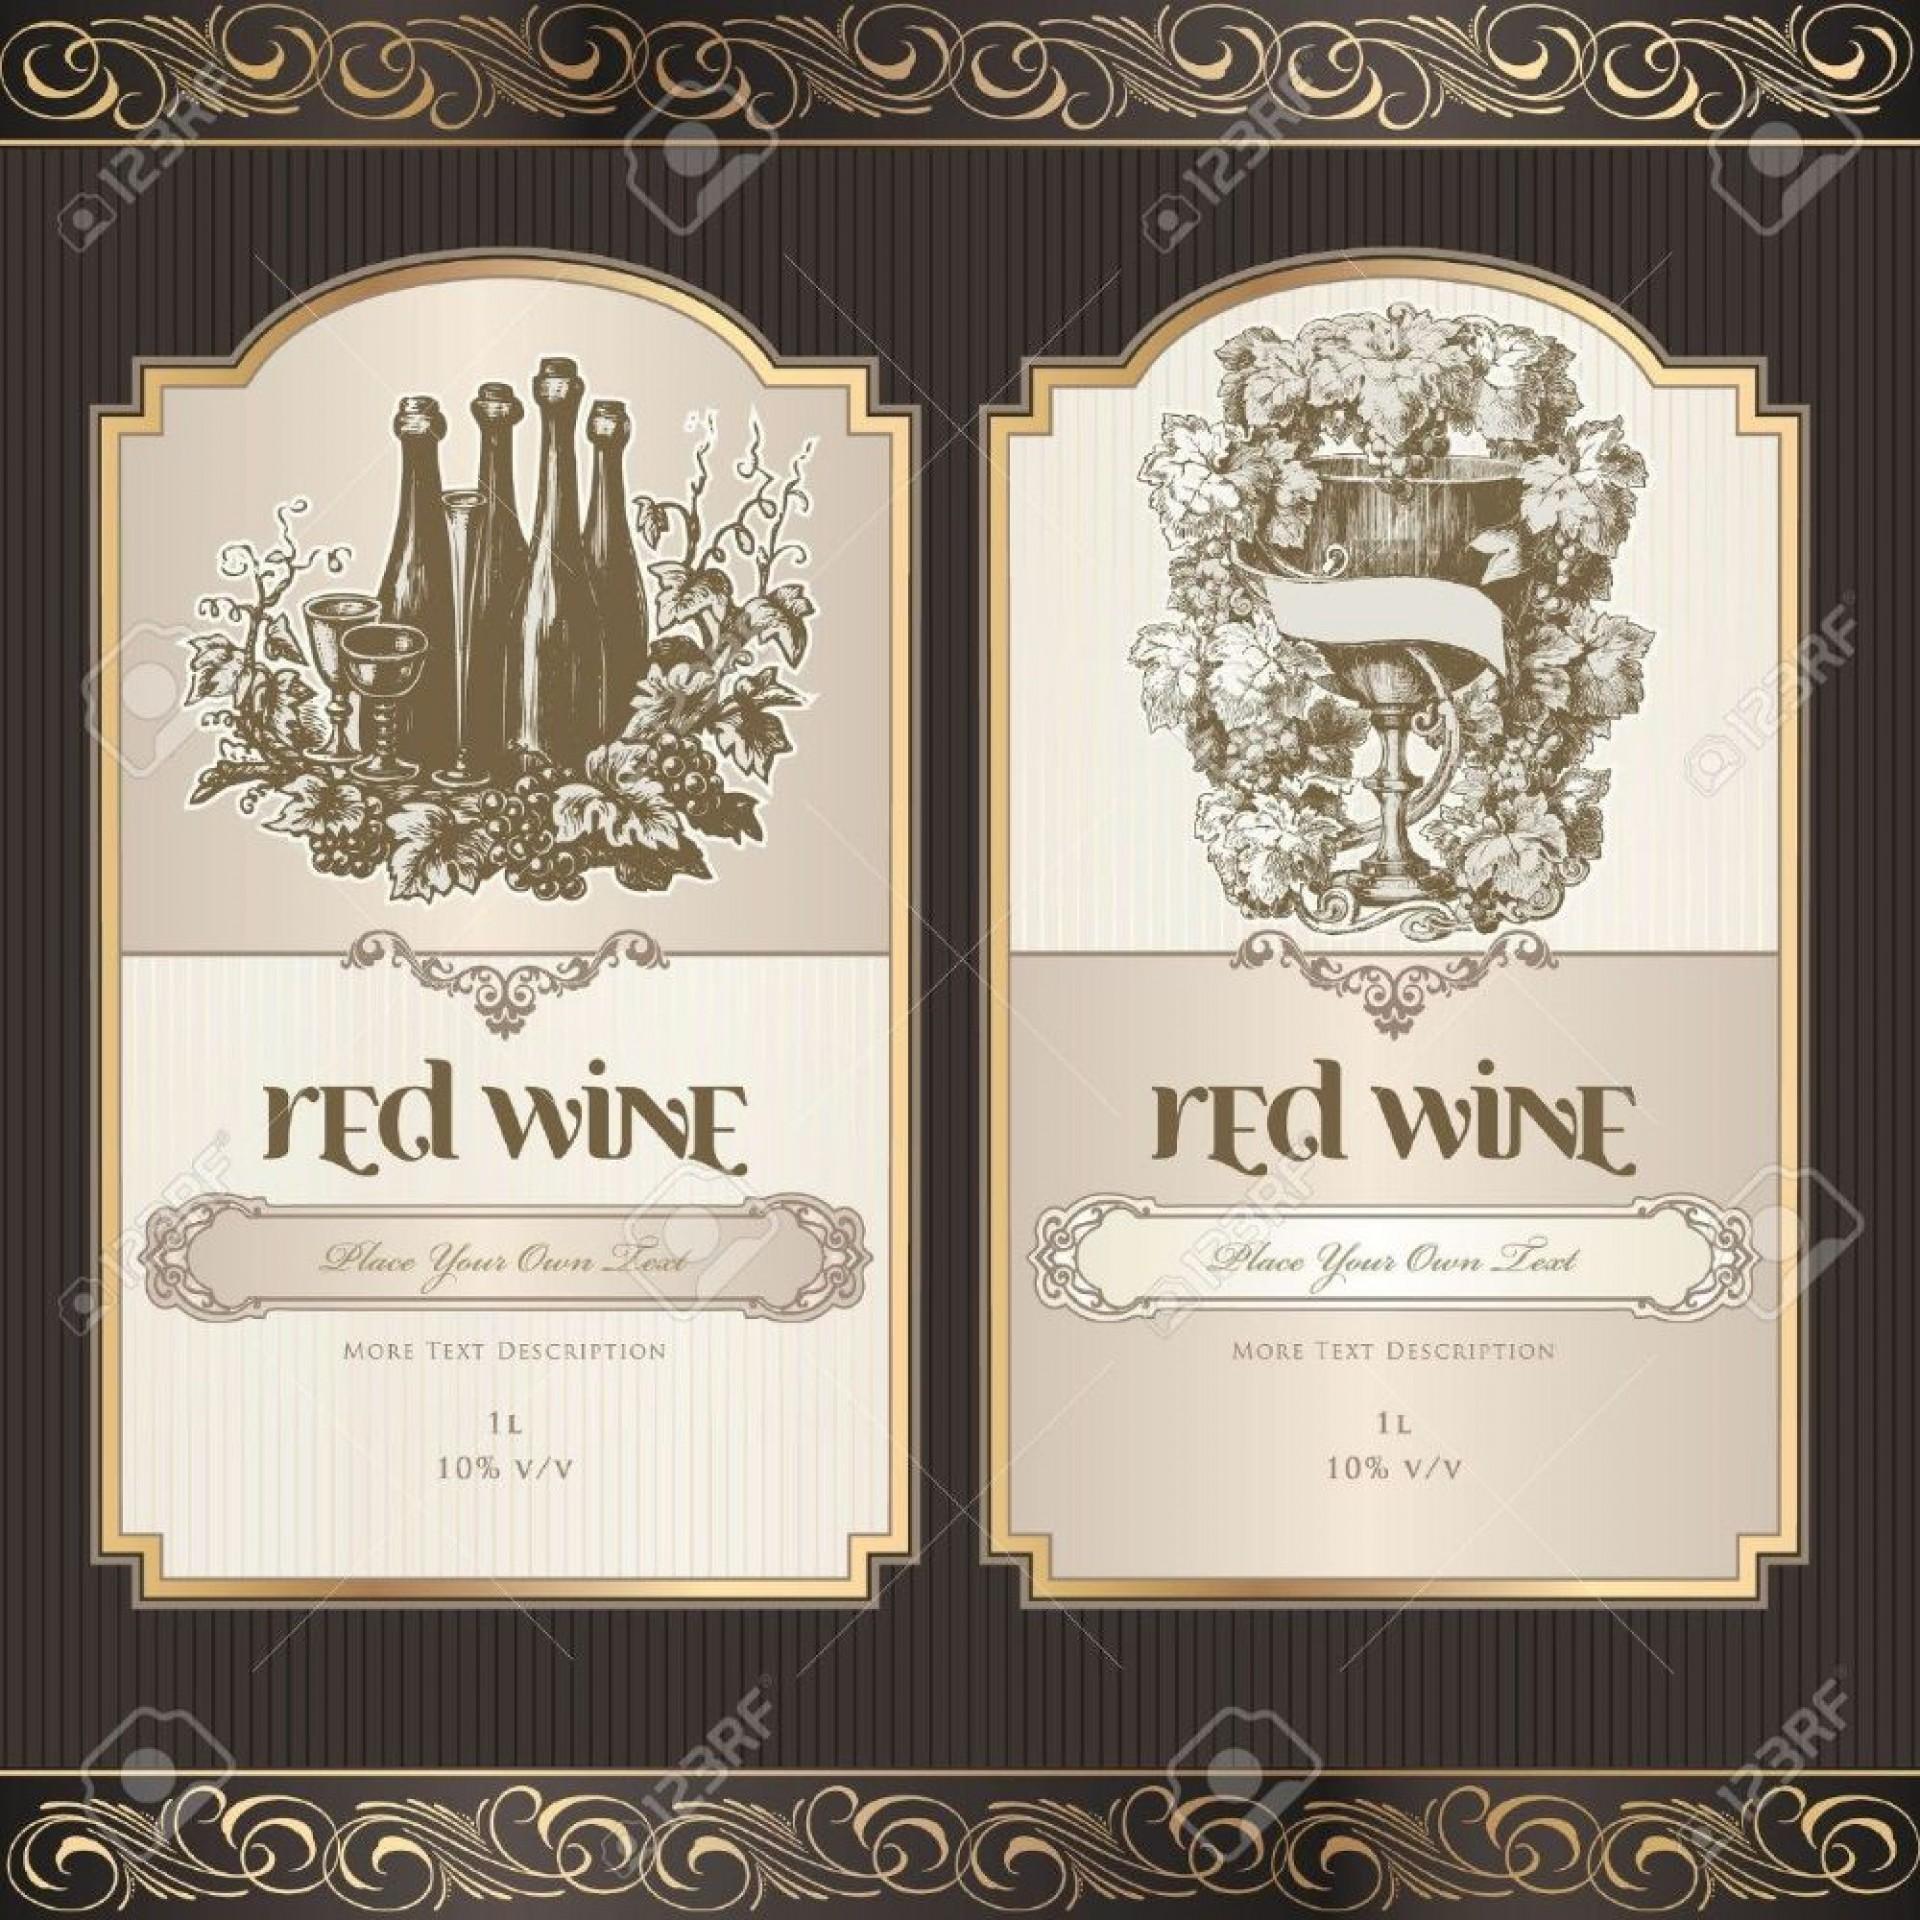 001 Striking Free Wine Bottle Label Template Idea  Mini Printable1920